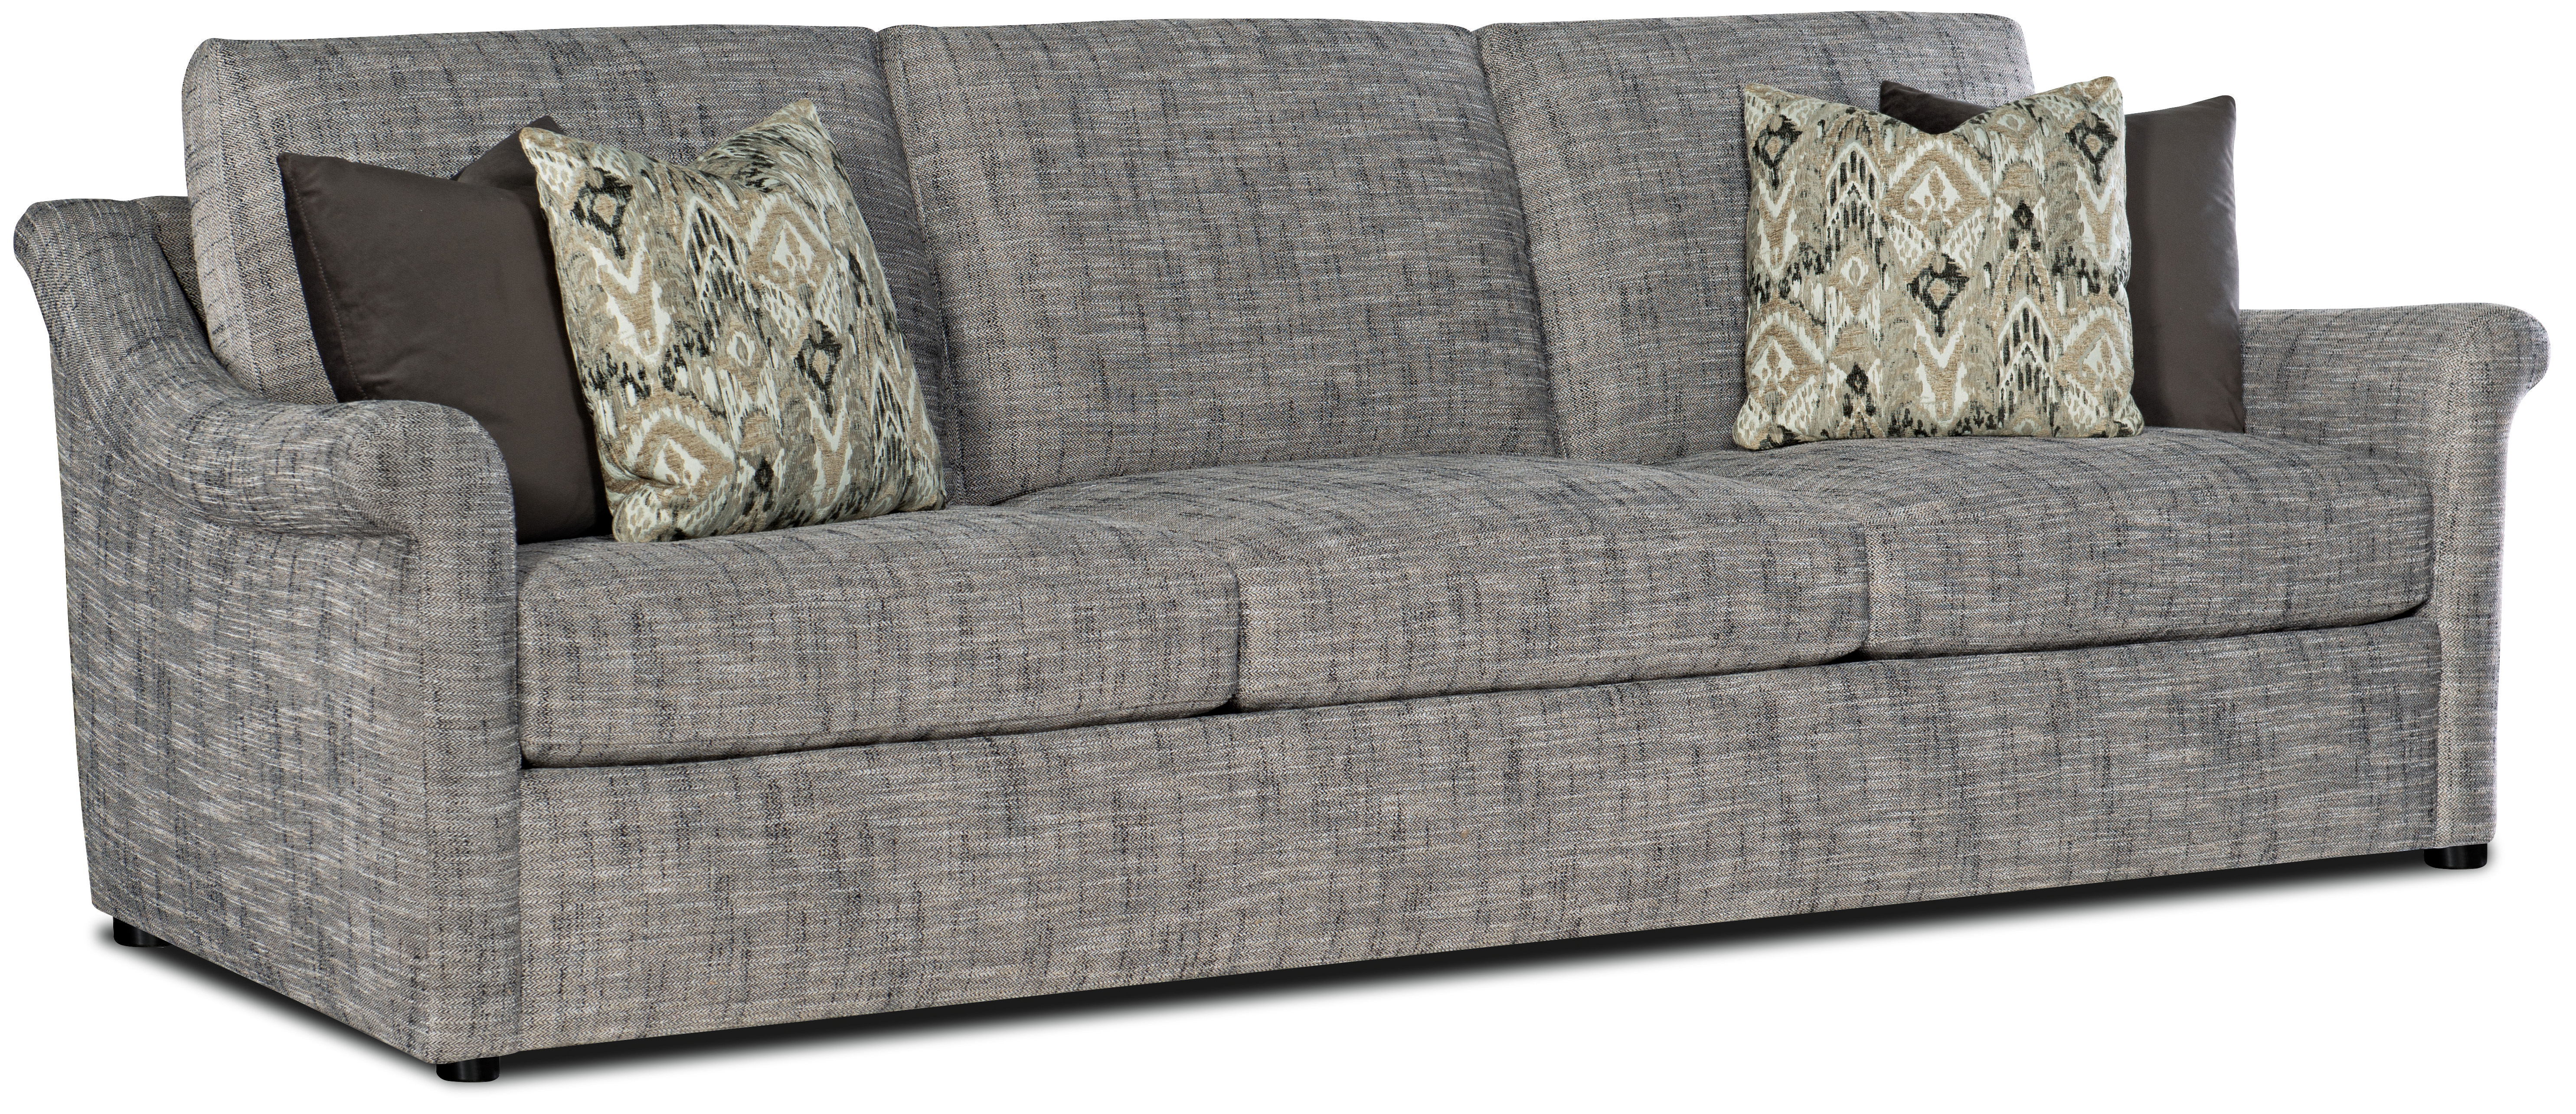 Danae Grand 99 Inch Sofa by Sam Moore at Esprit Decor Home Furnishings